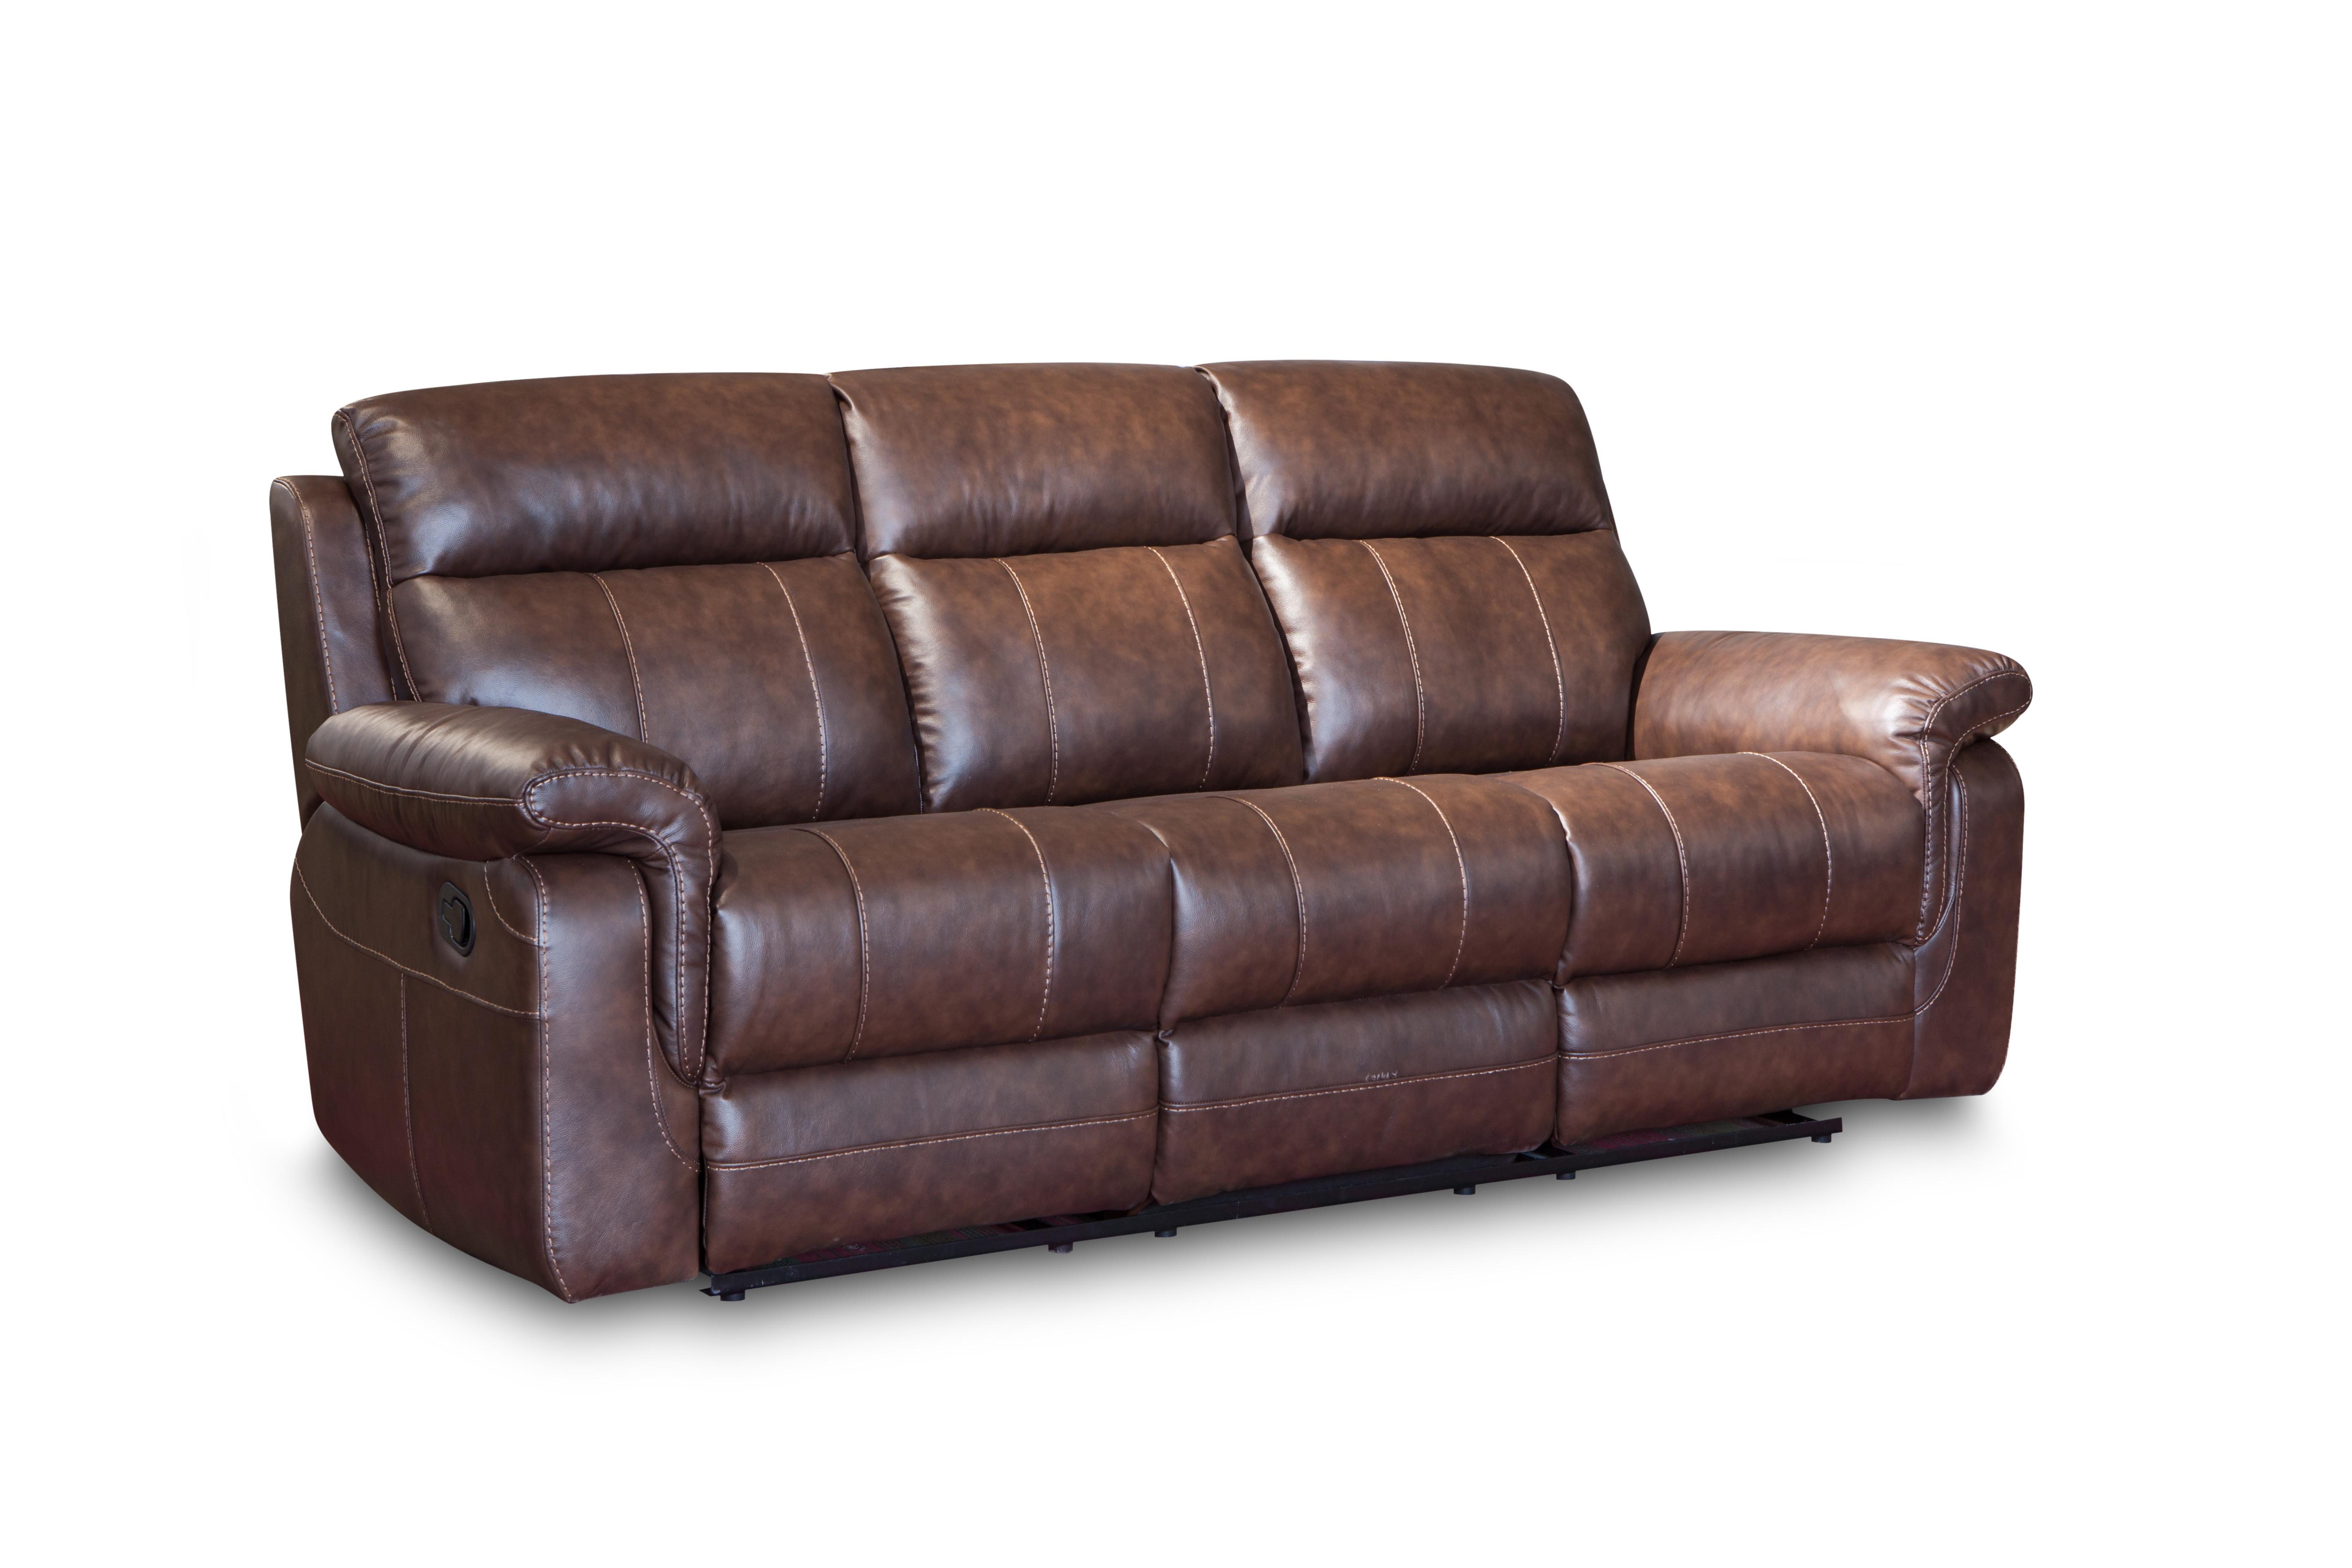 China Good Quality Corner Furniture Leather Recliner Sofa